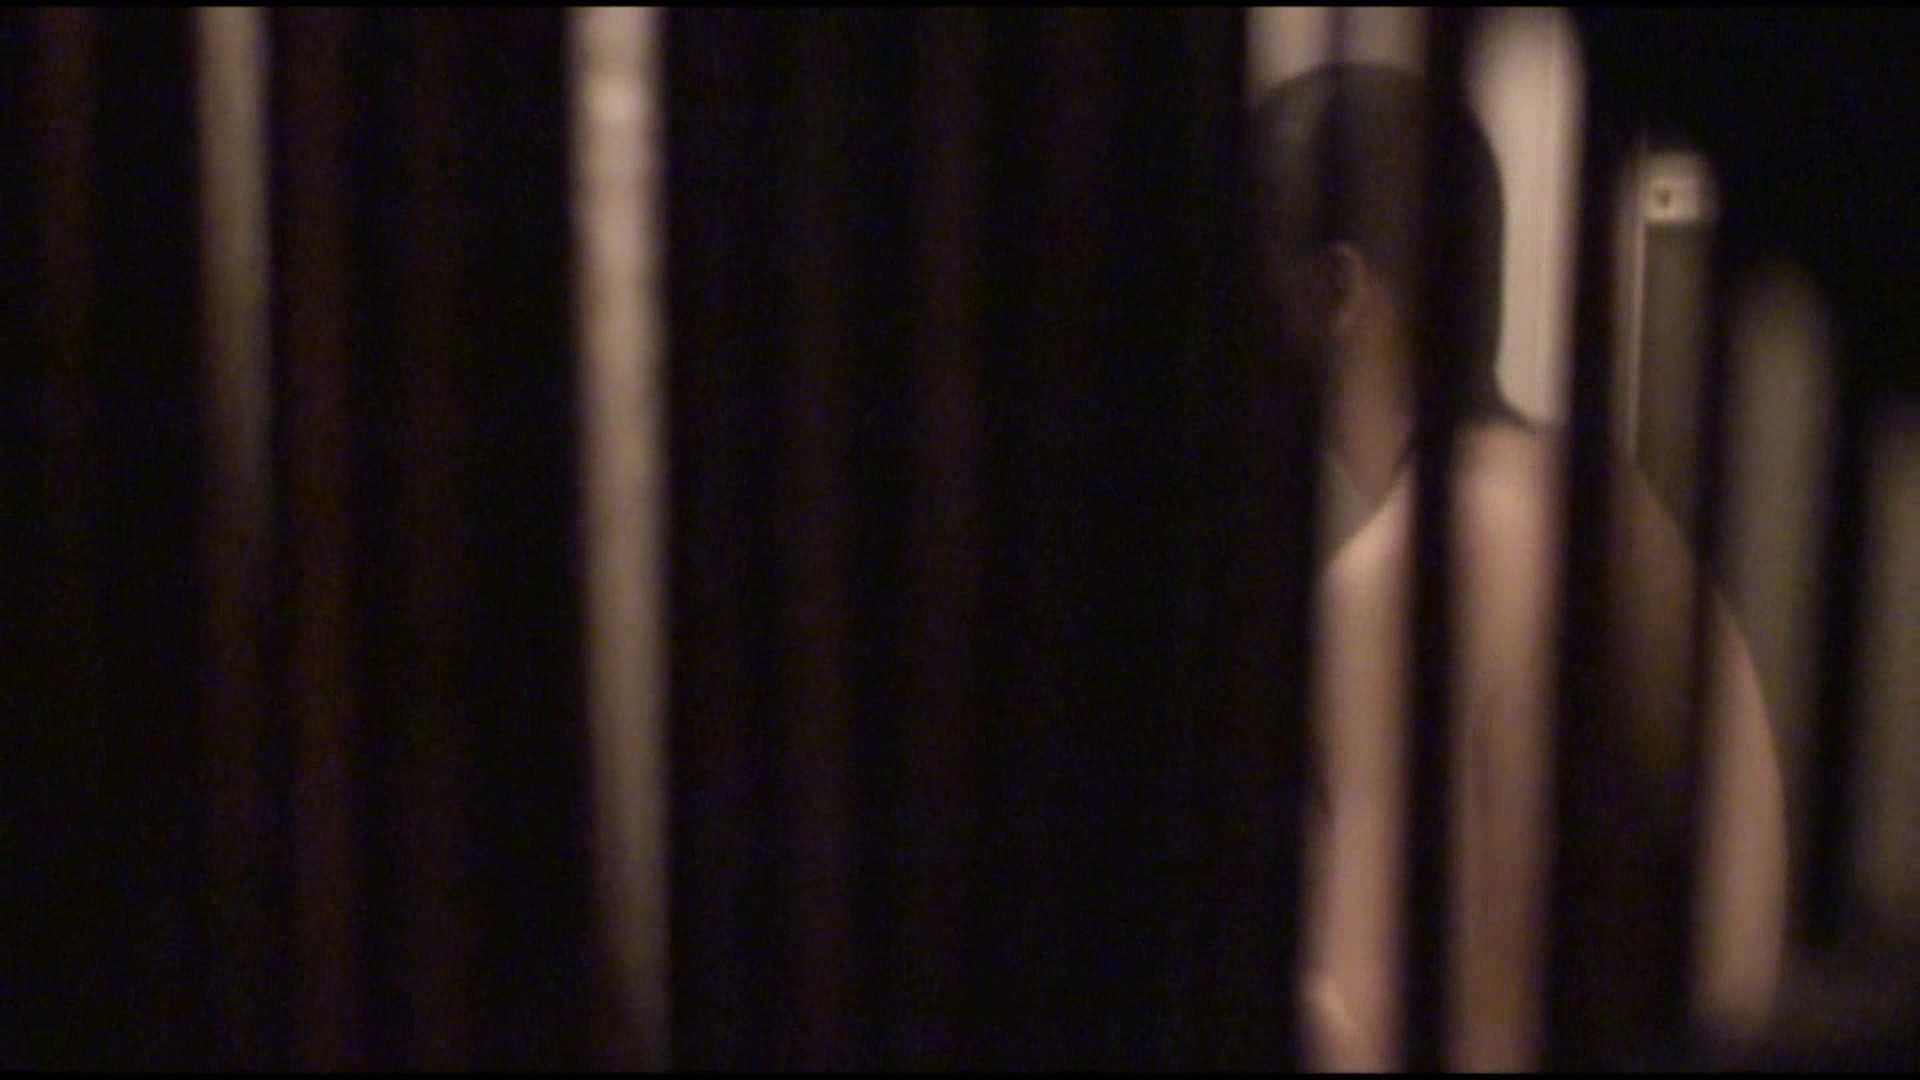 vol.05最高の極上美人!可愛い彼女の裸体をどうぞ!風呂上り鏡チェックも必見! 美人  68pic 44